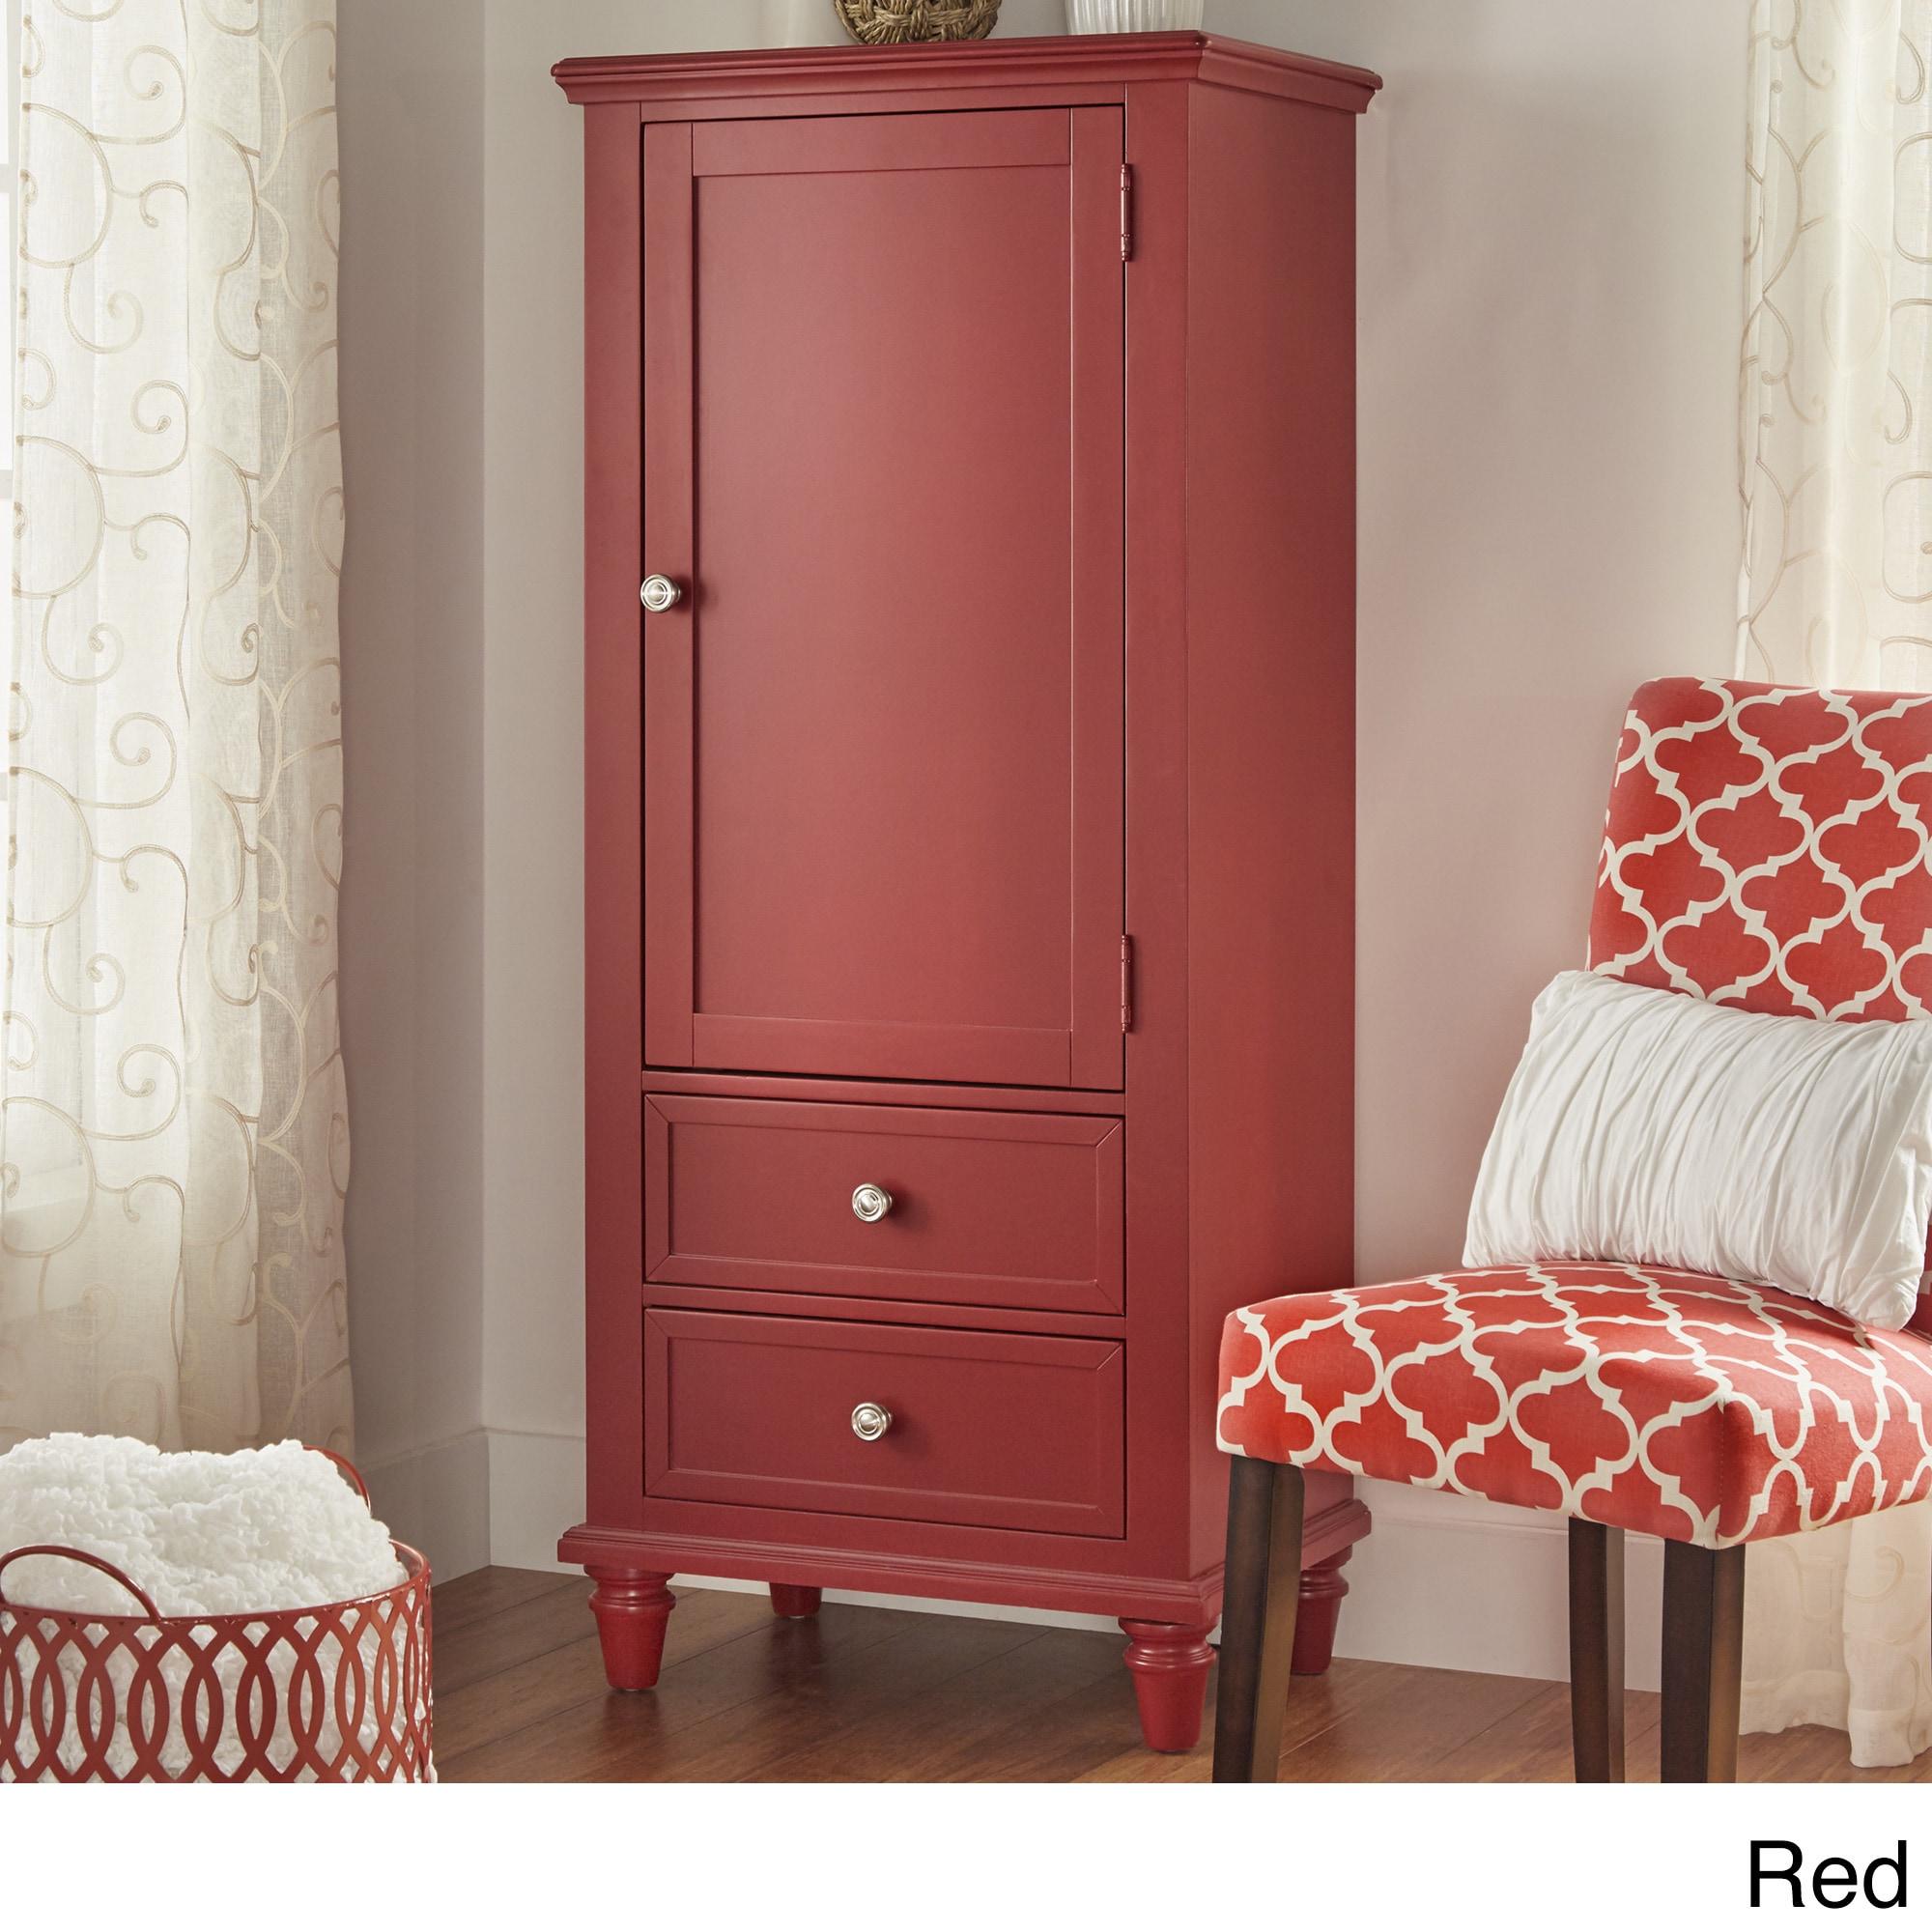 Attractive Preston Wooden Wardrobe Storage Armoire By INSPIRE Q Junior   Free Shipping  Today   Overstock.com   18687883